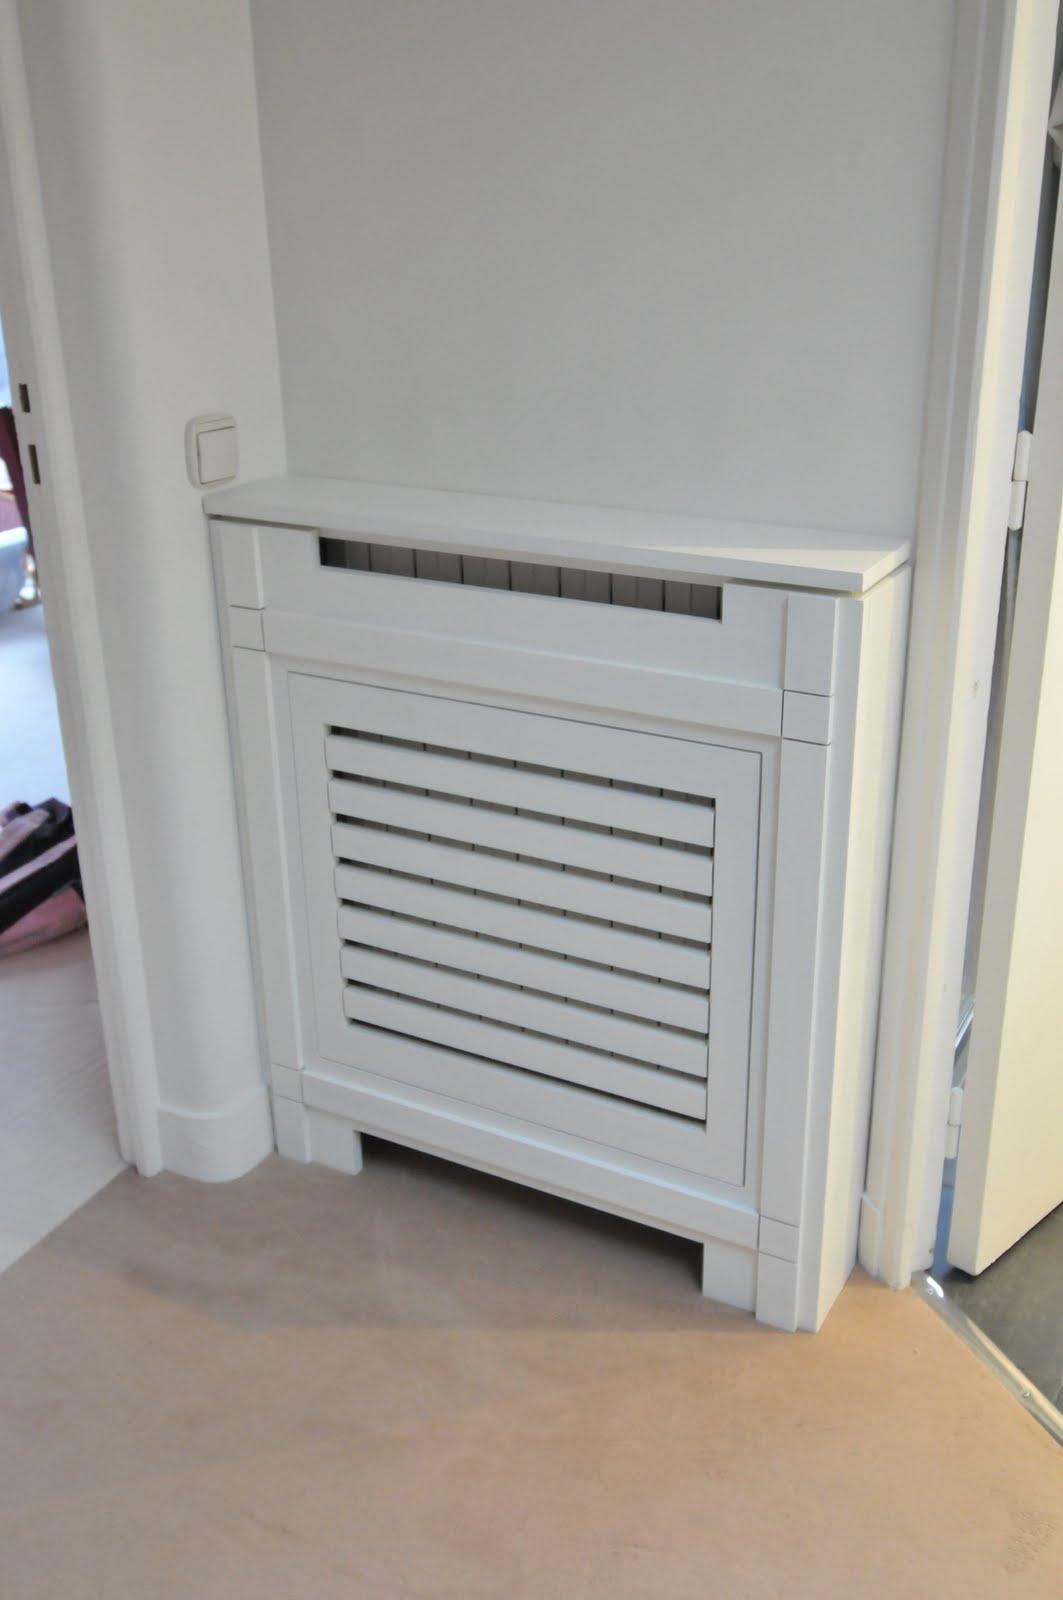 cache radiateur. Black Bedroom Furniture Sets. Home Design Ideas